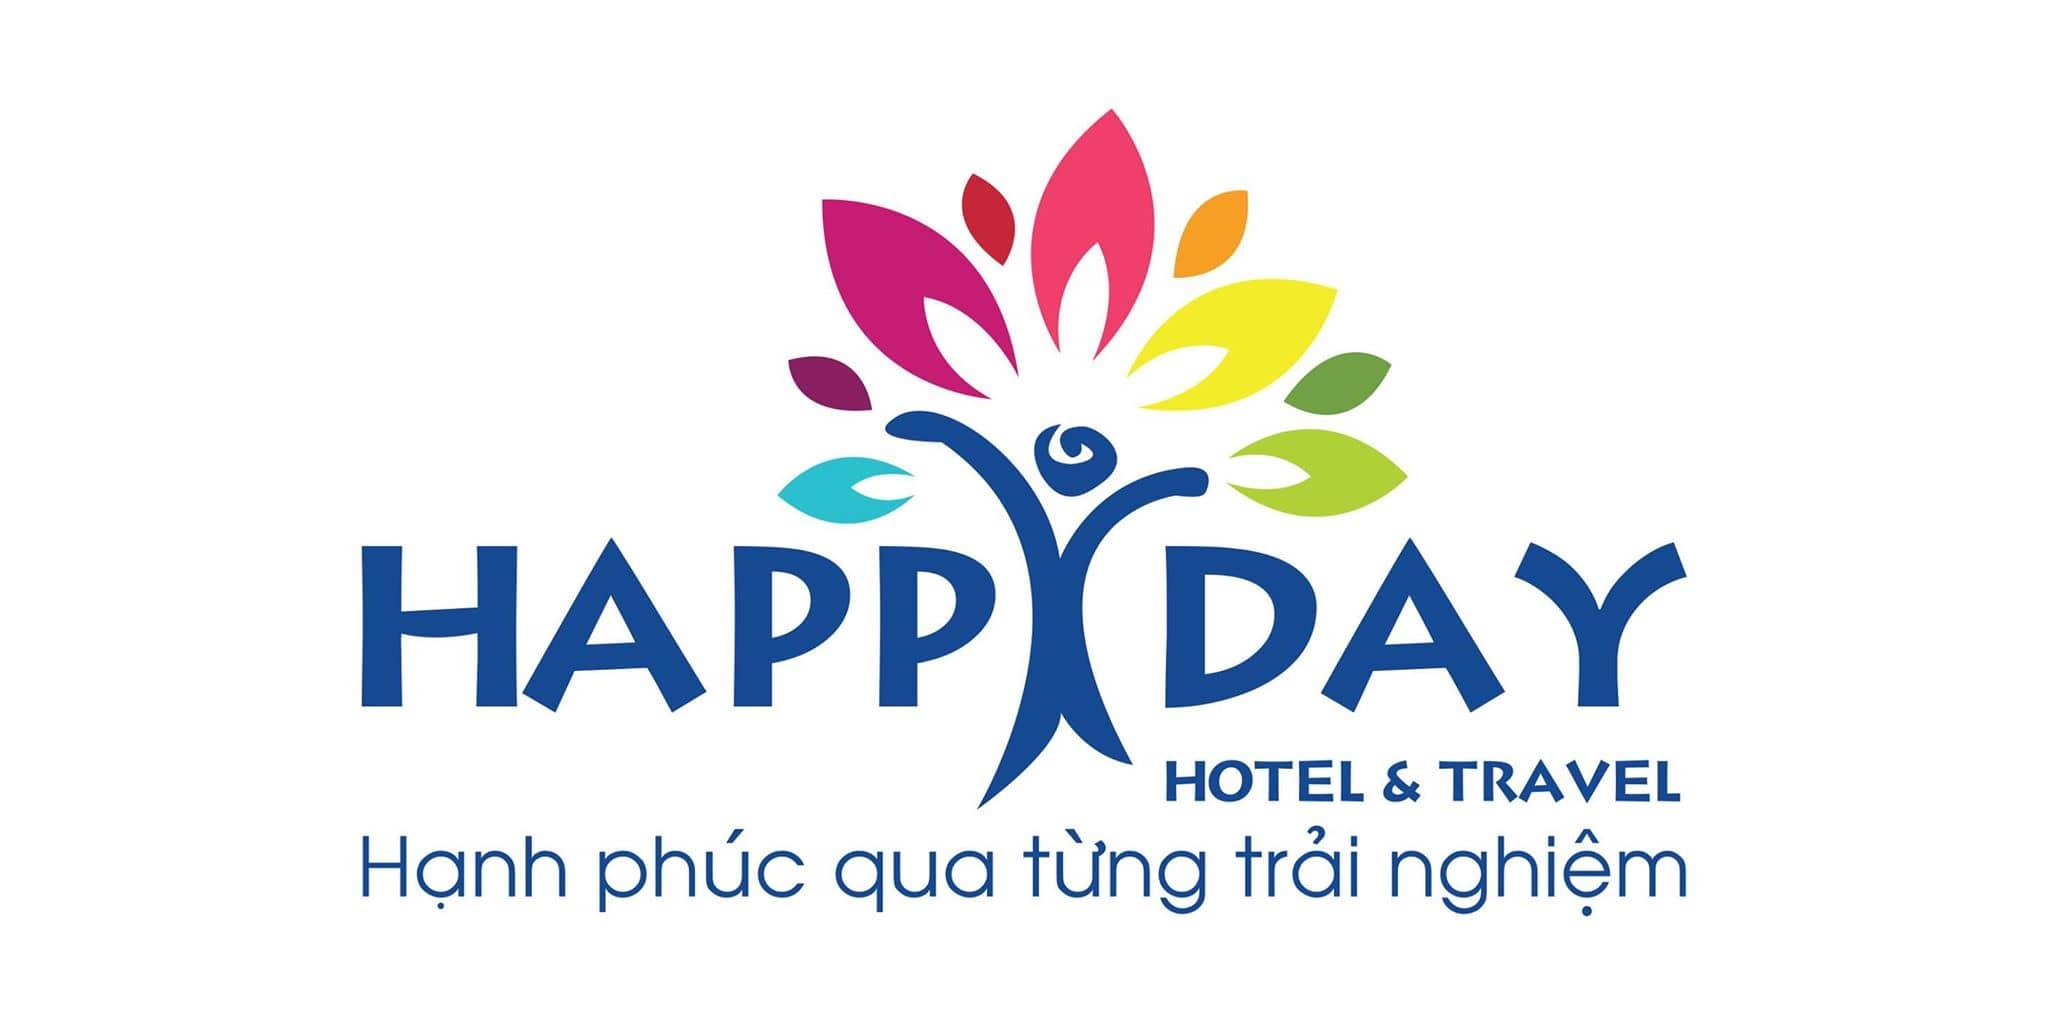 Dịch vụ tại Happy Day Travel